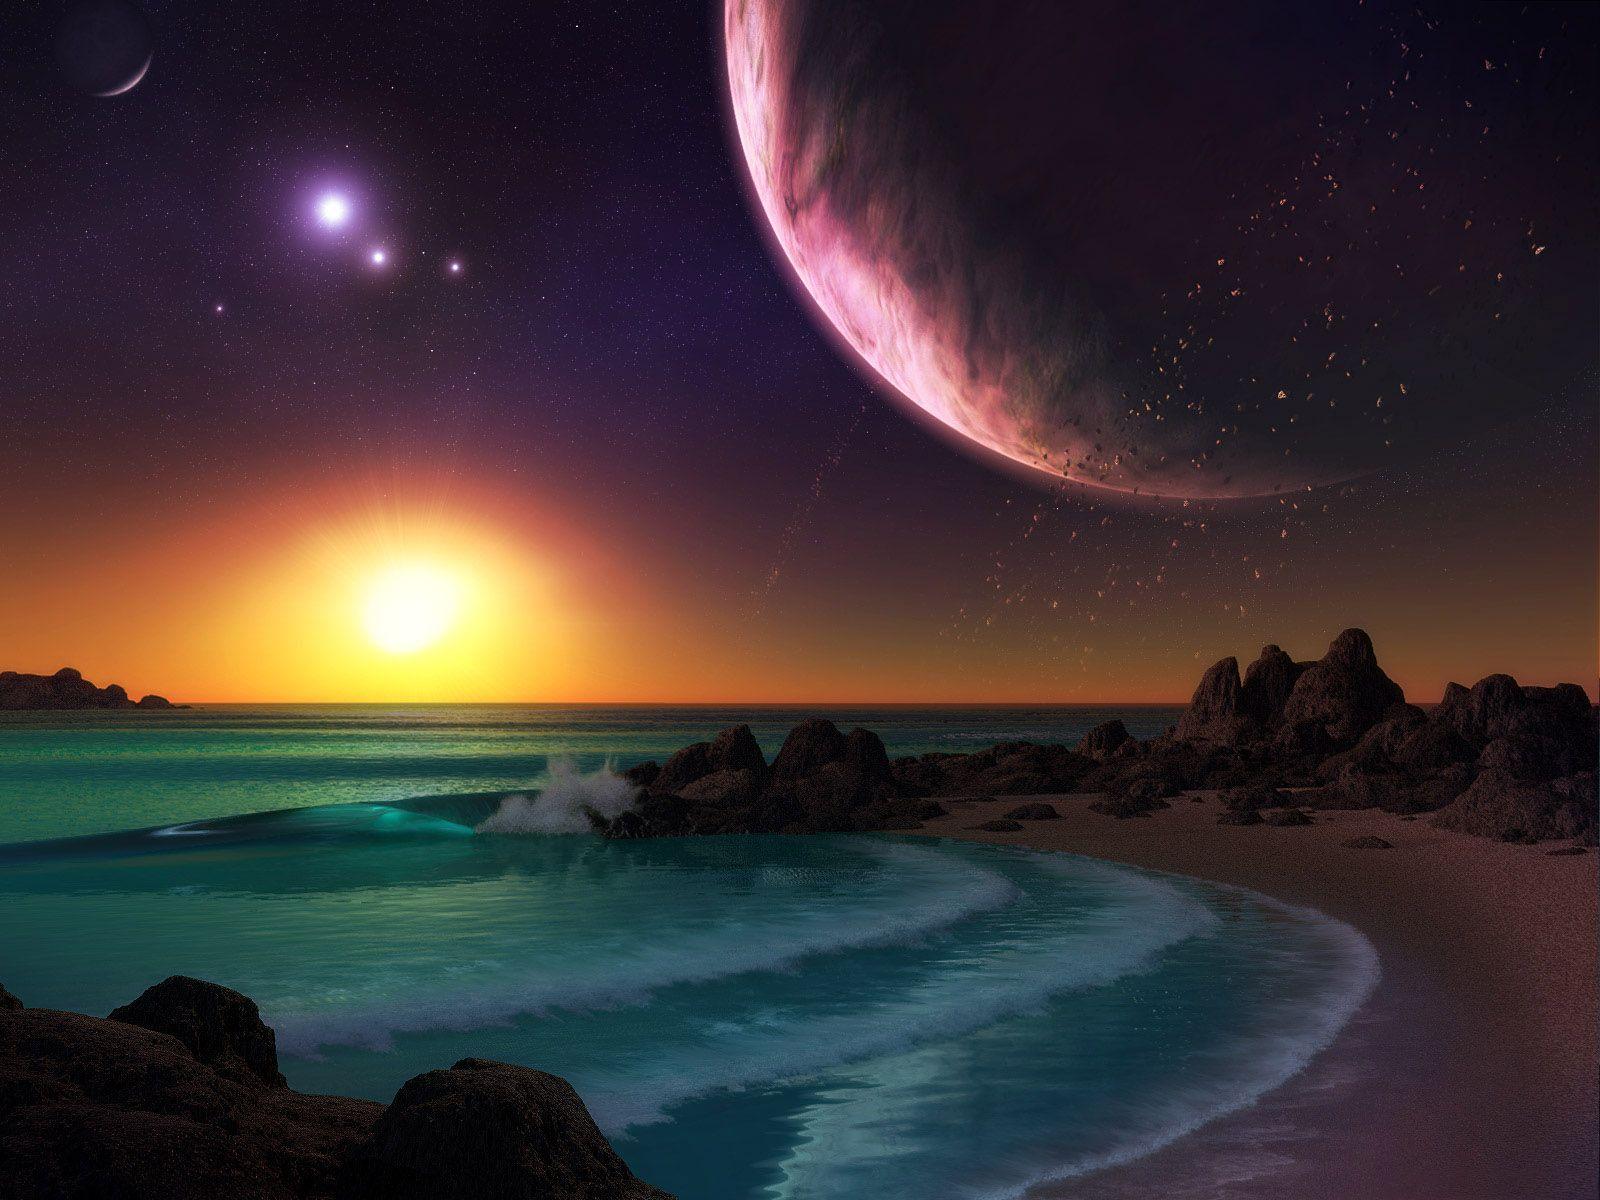 2560x1920 Planets Houses Ocean Rocks Sky desktop PC and Mac wallpaper